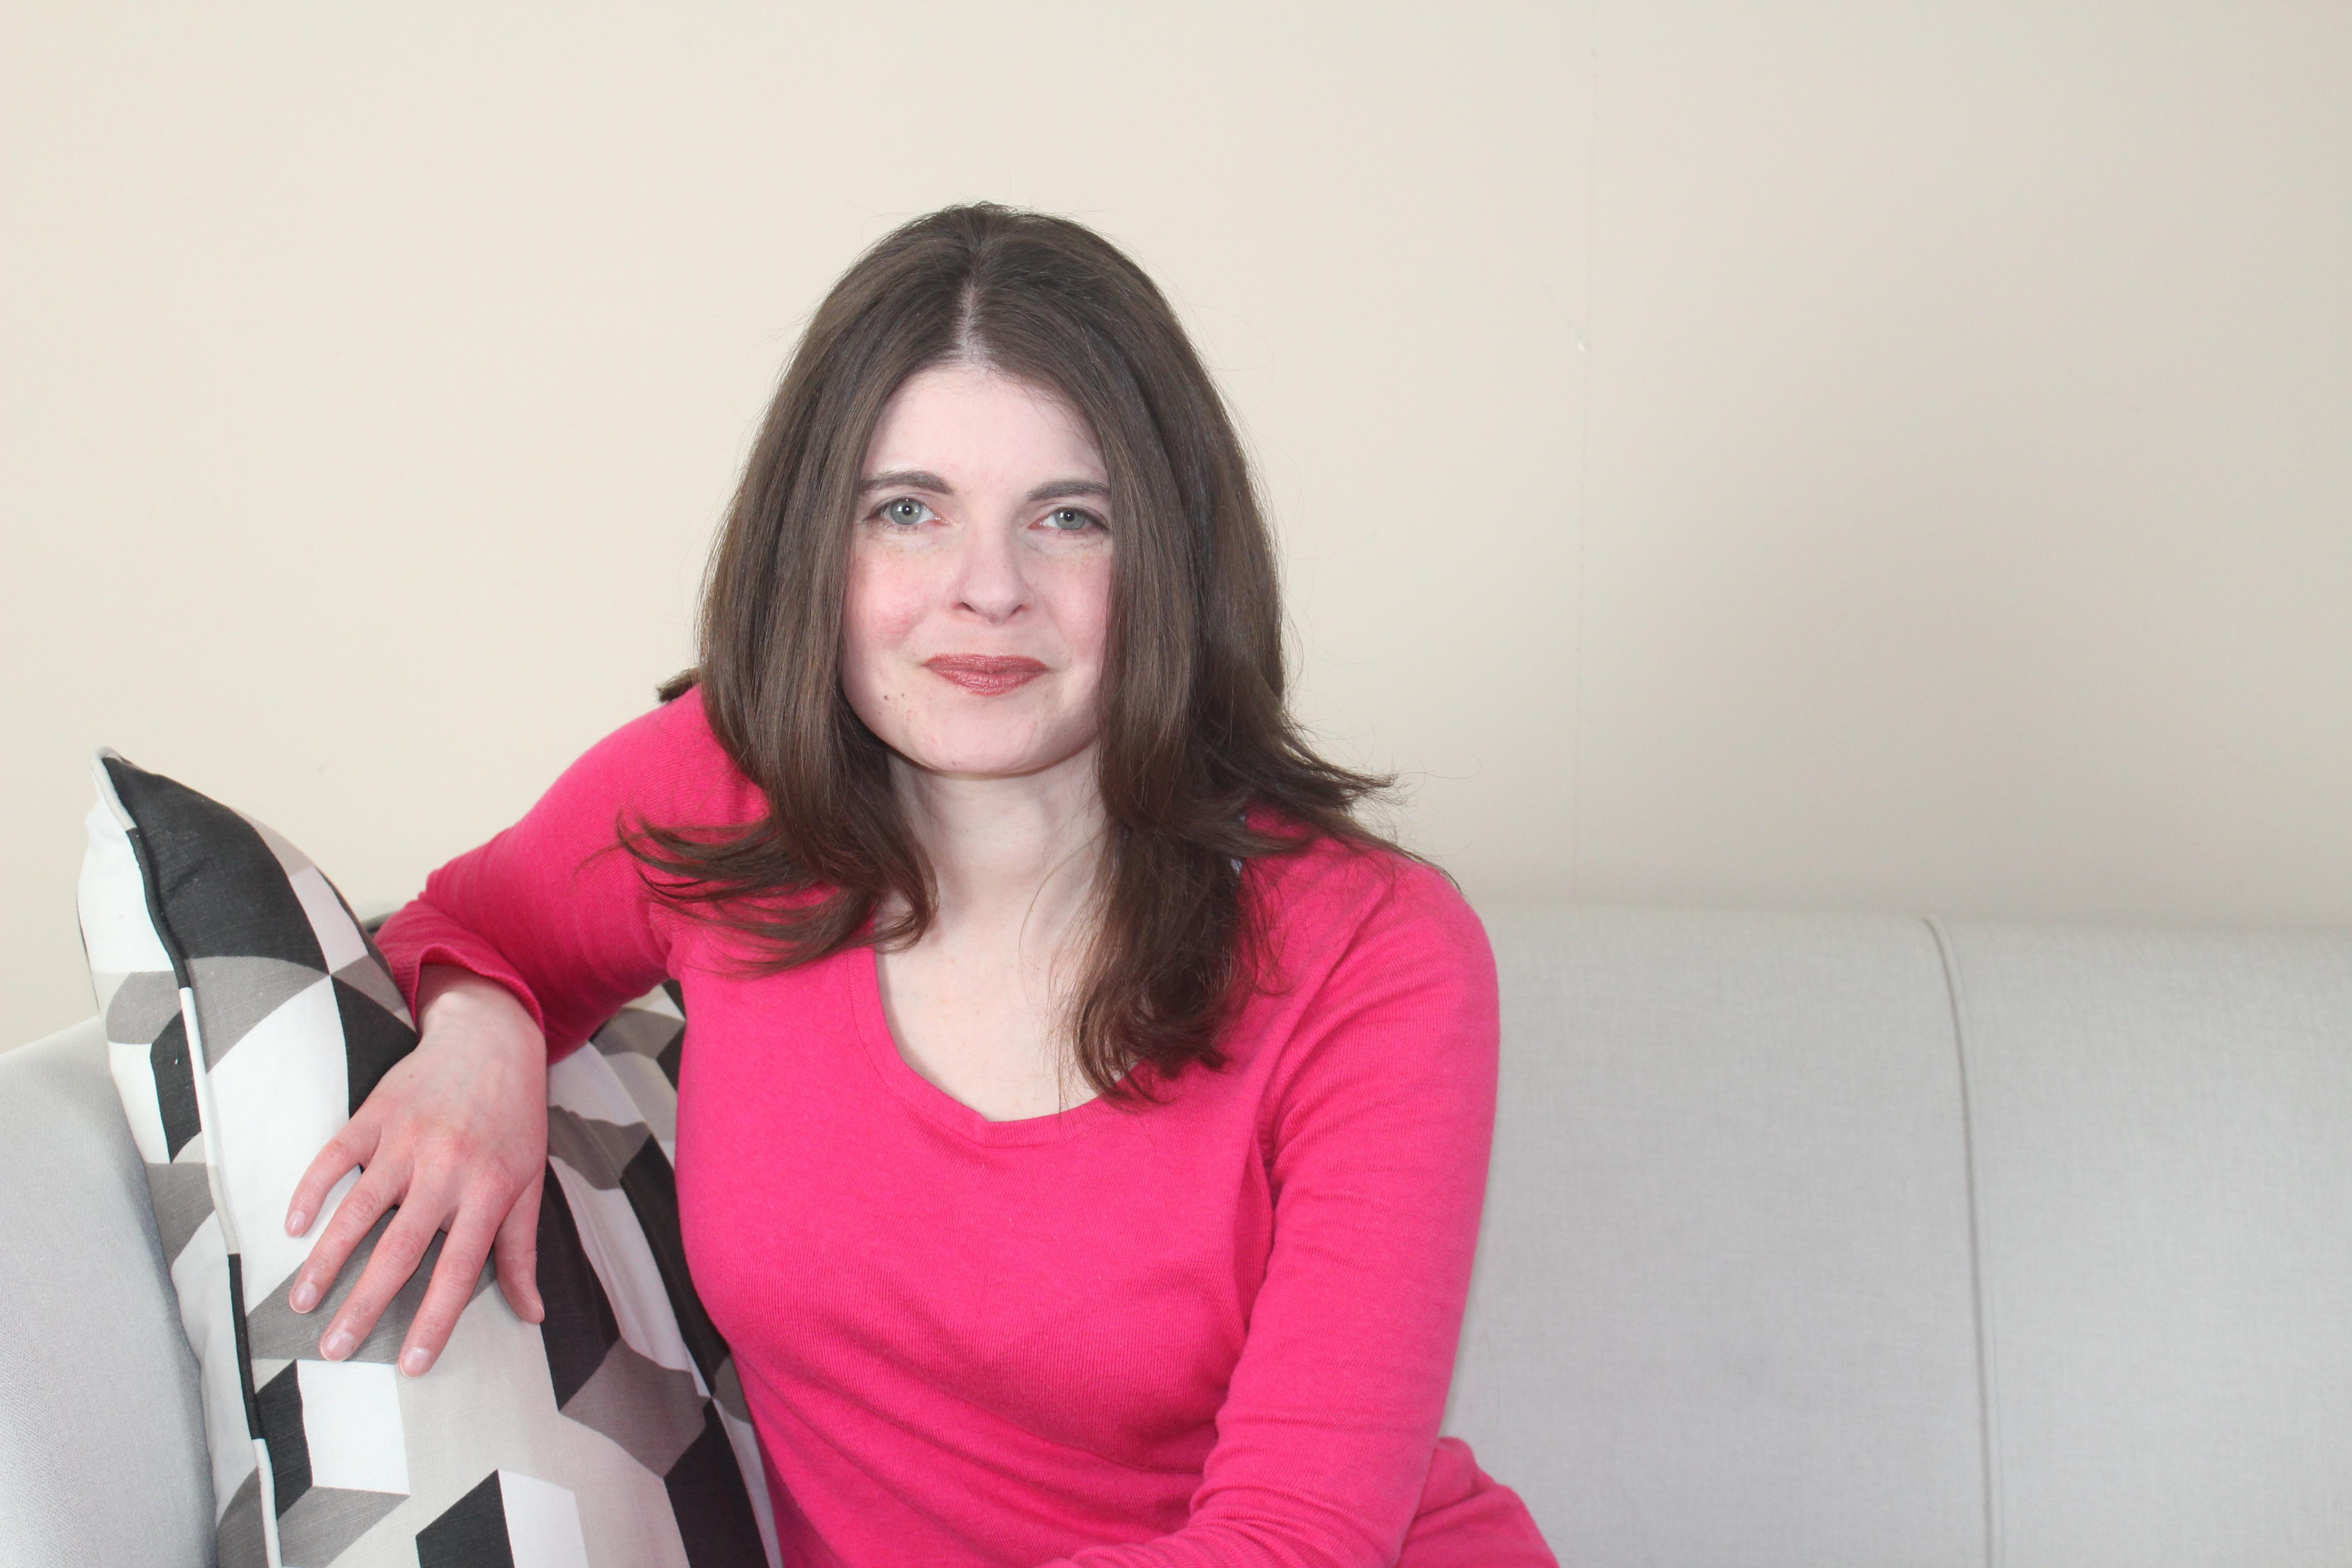 Tammy Karatchuk